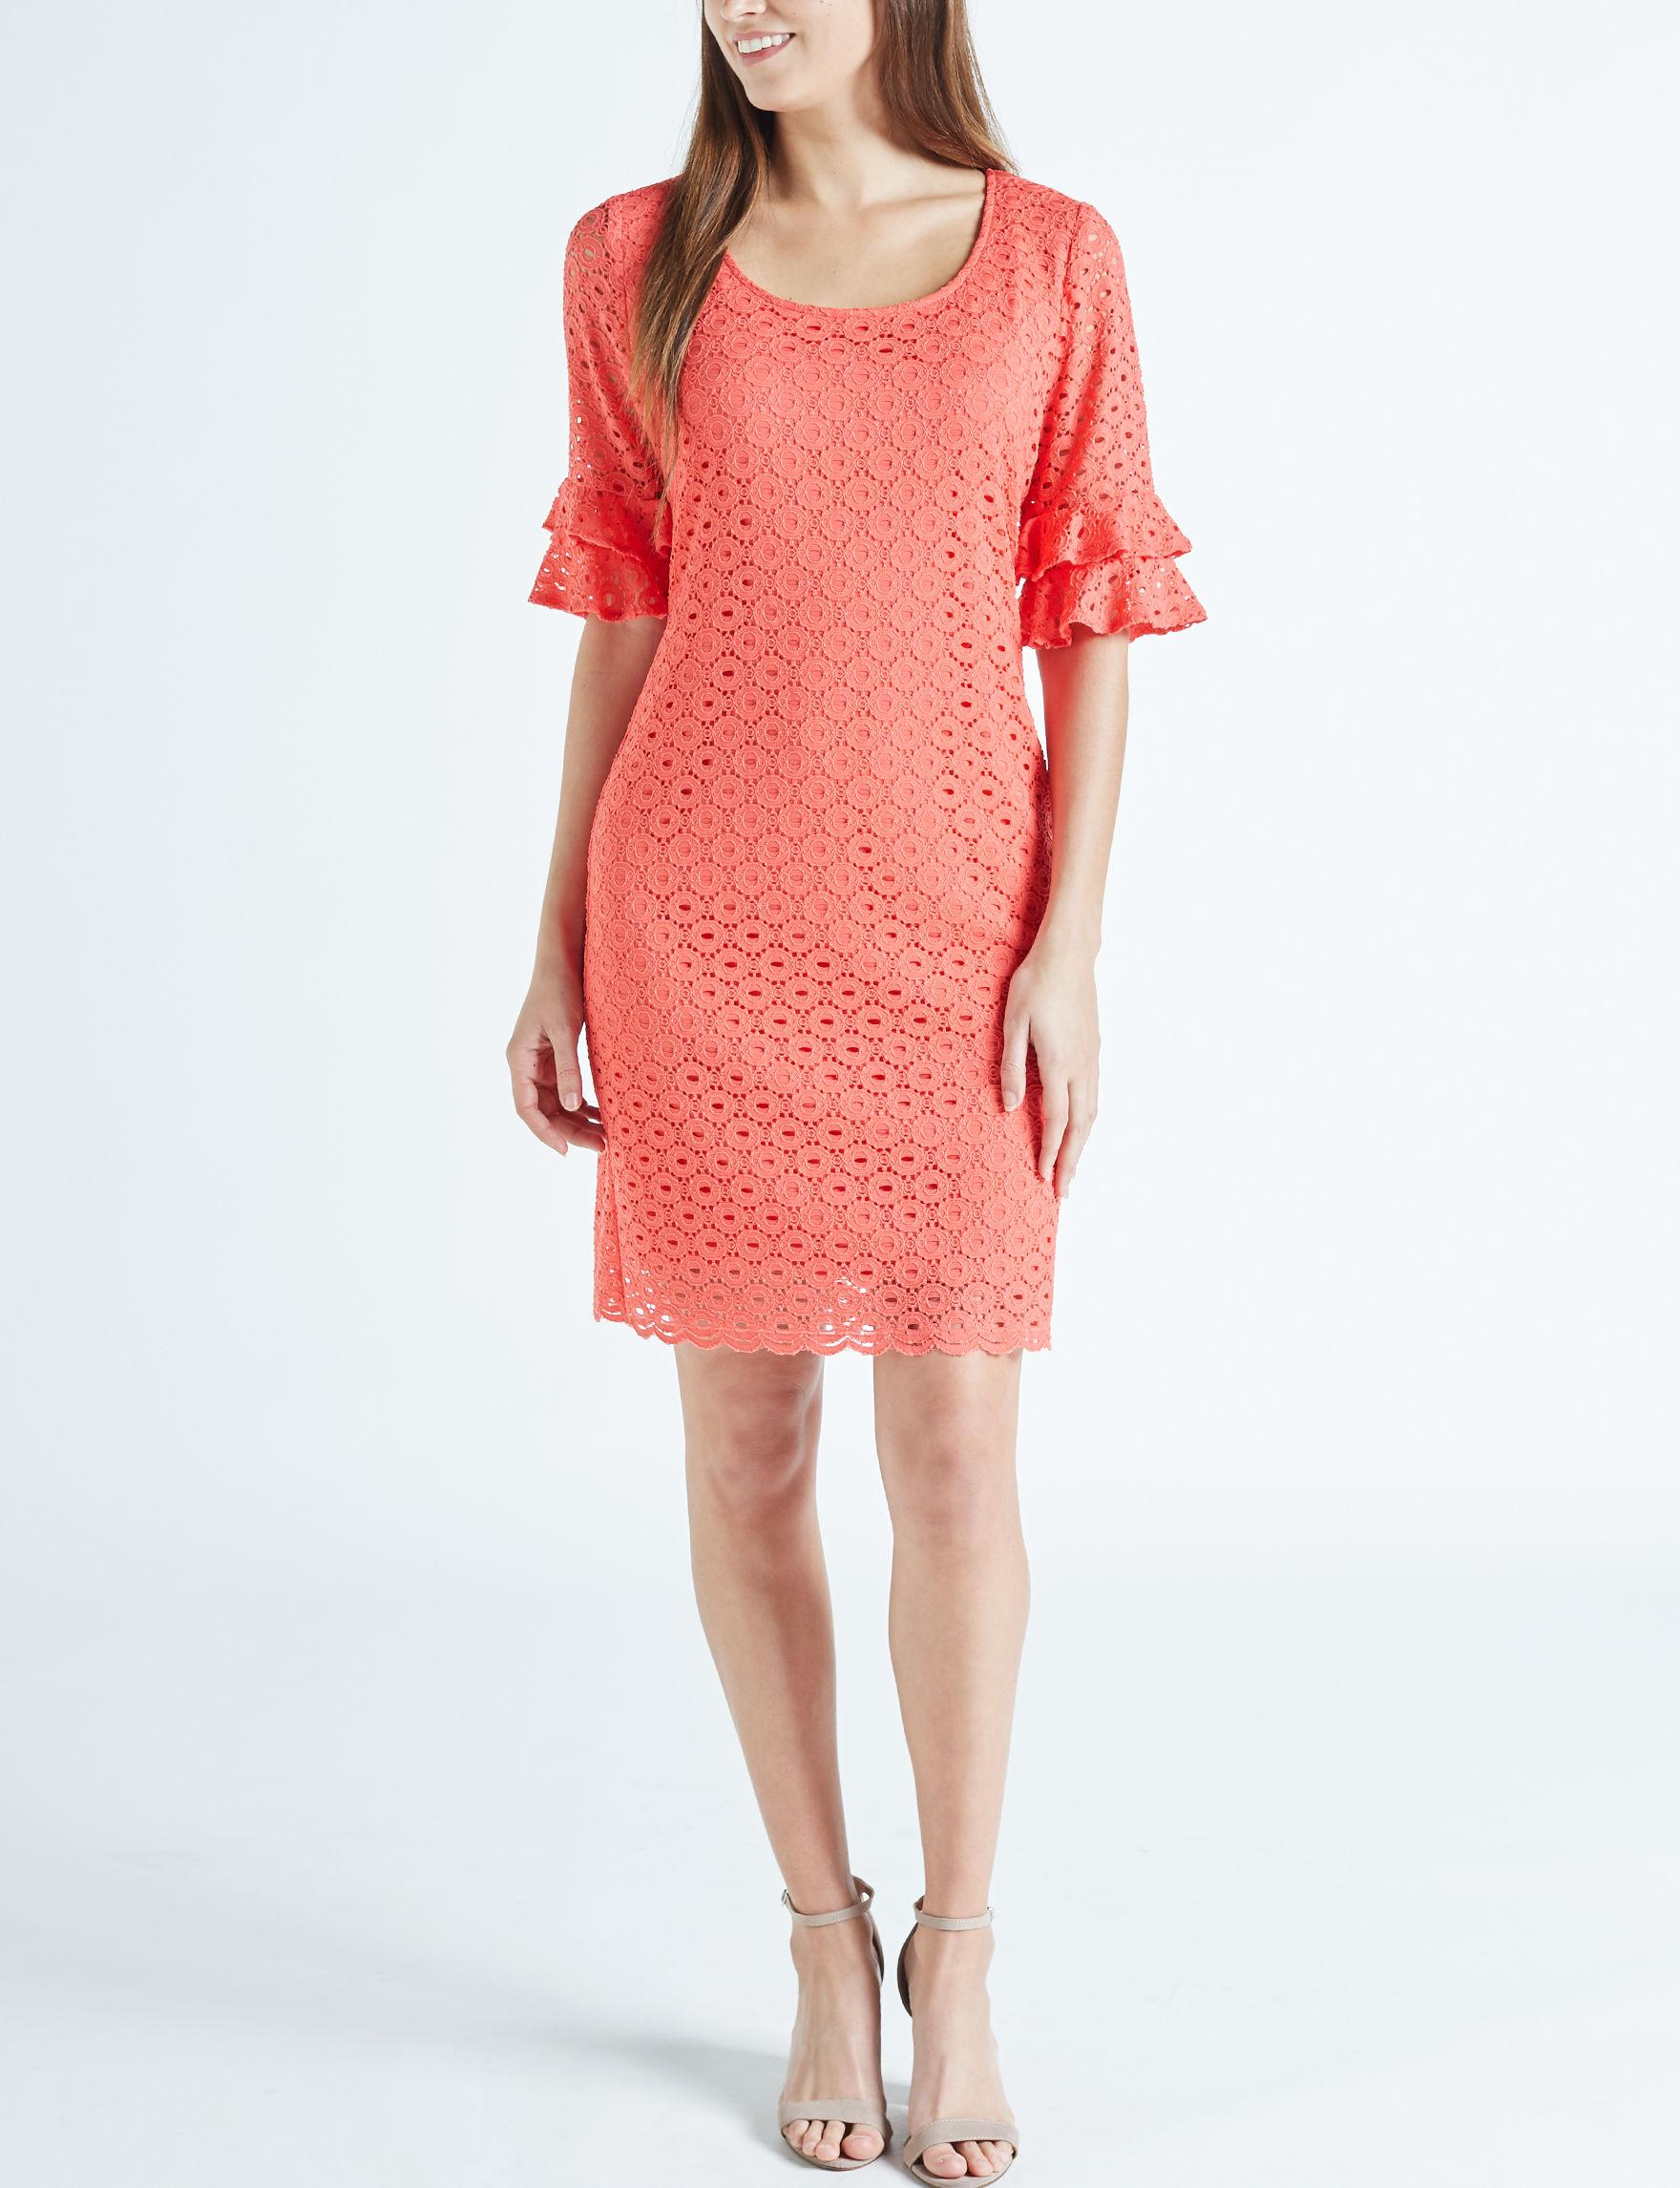 Ronni Nicole Coral Everyday & Casual Sheath Dresses